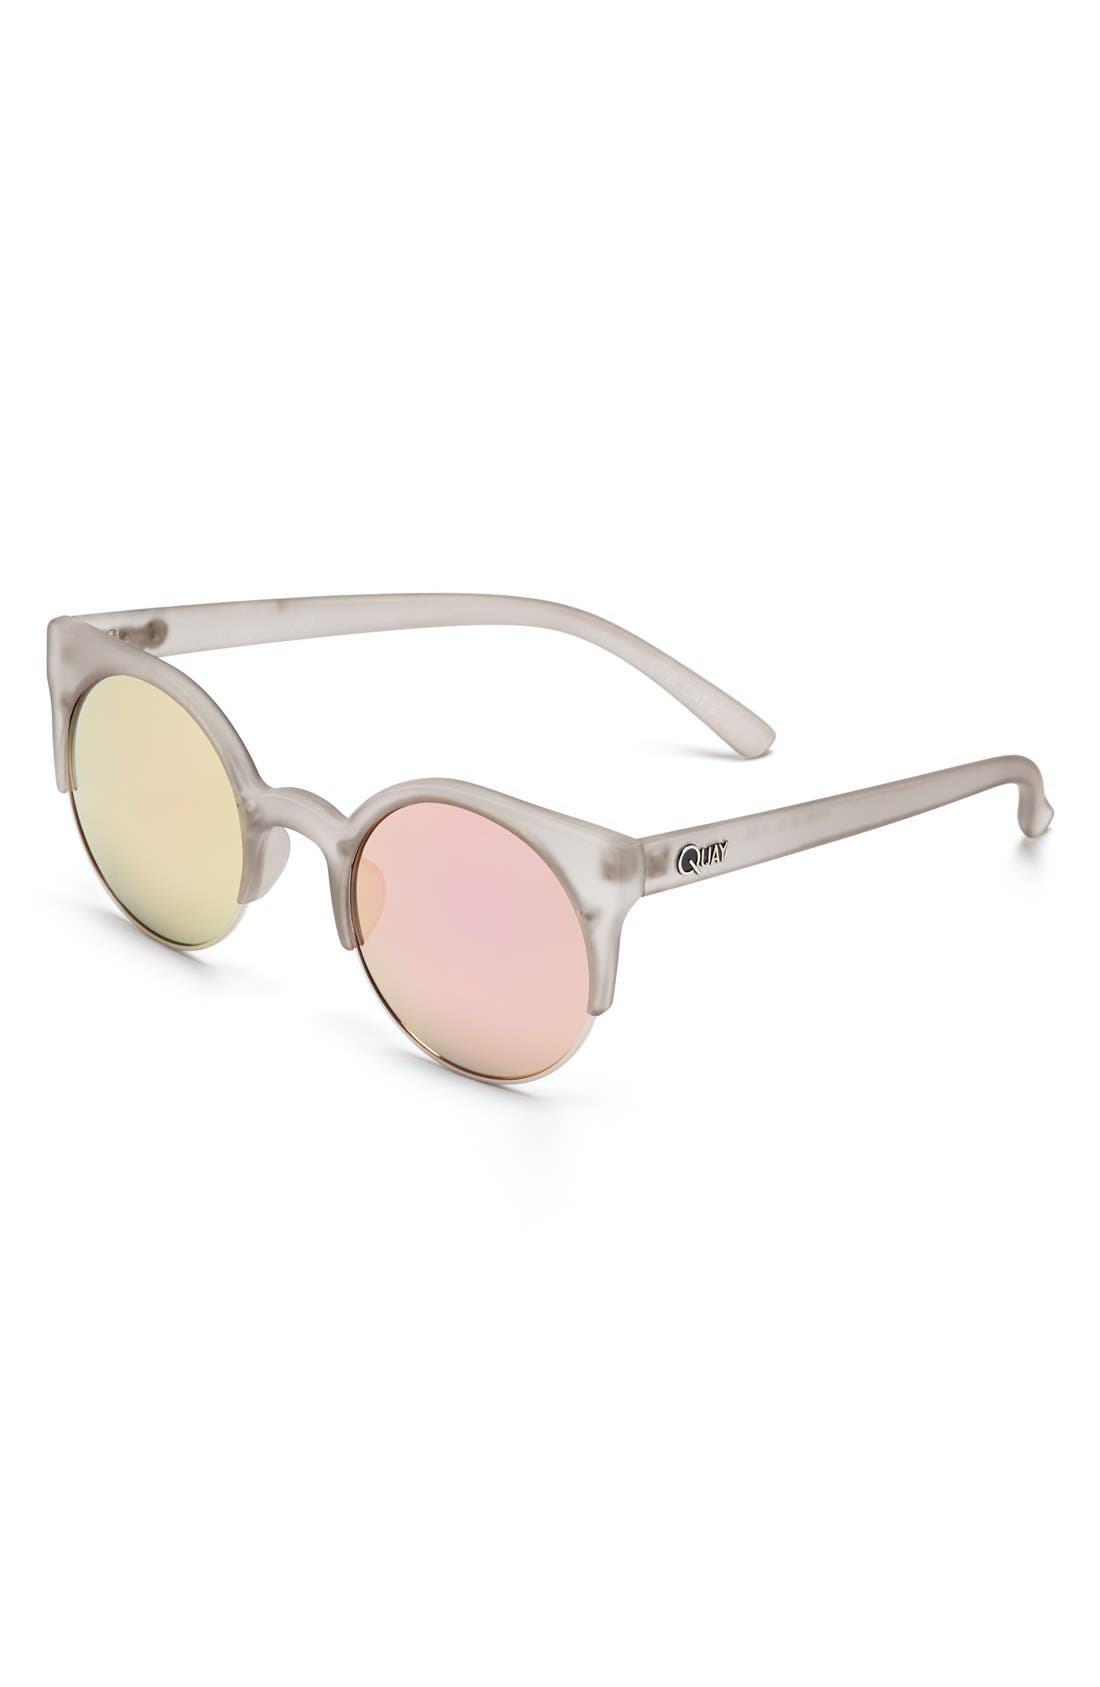 Main Image - Quay Australia 'Harlm' 50mm Sunglasses